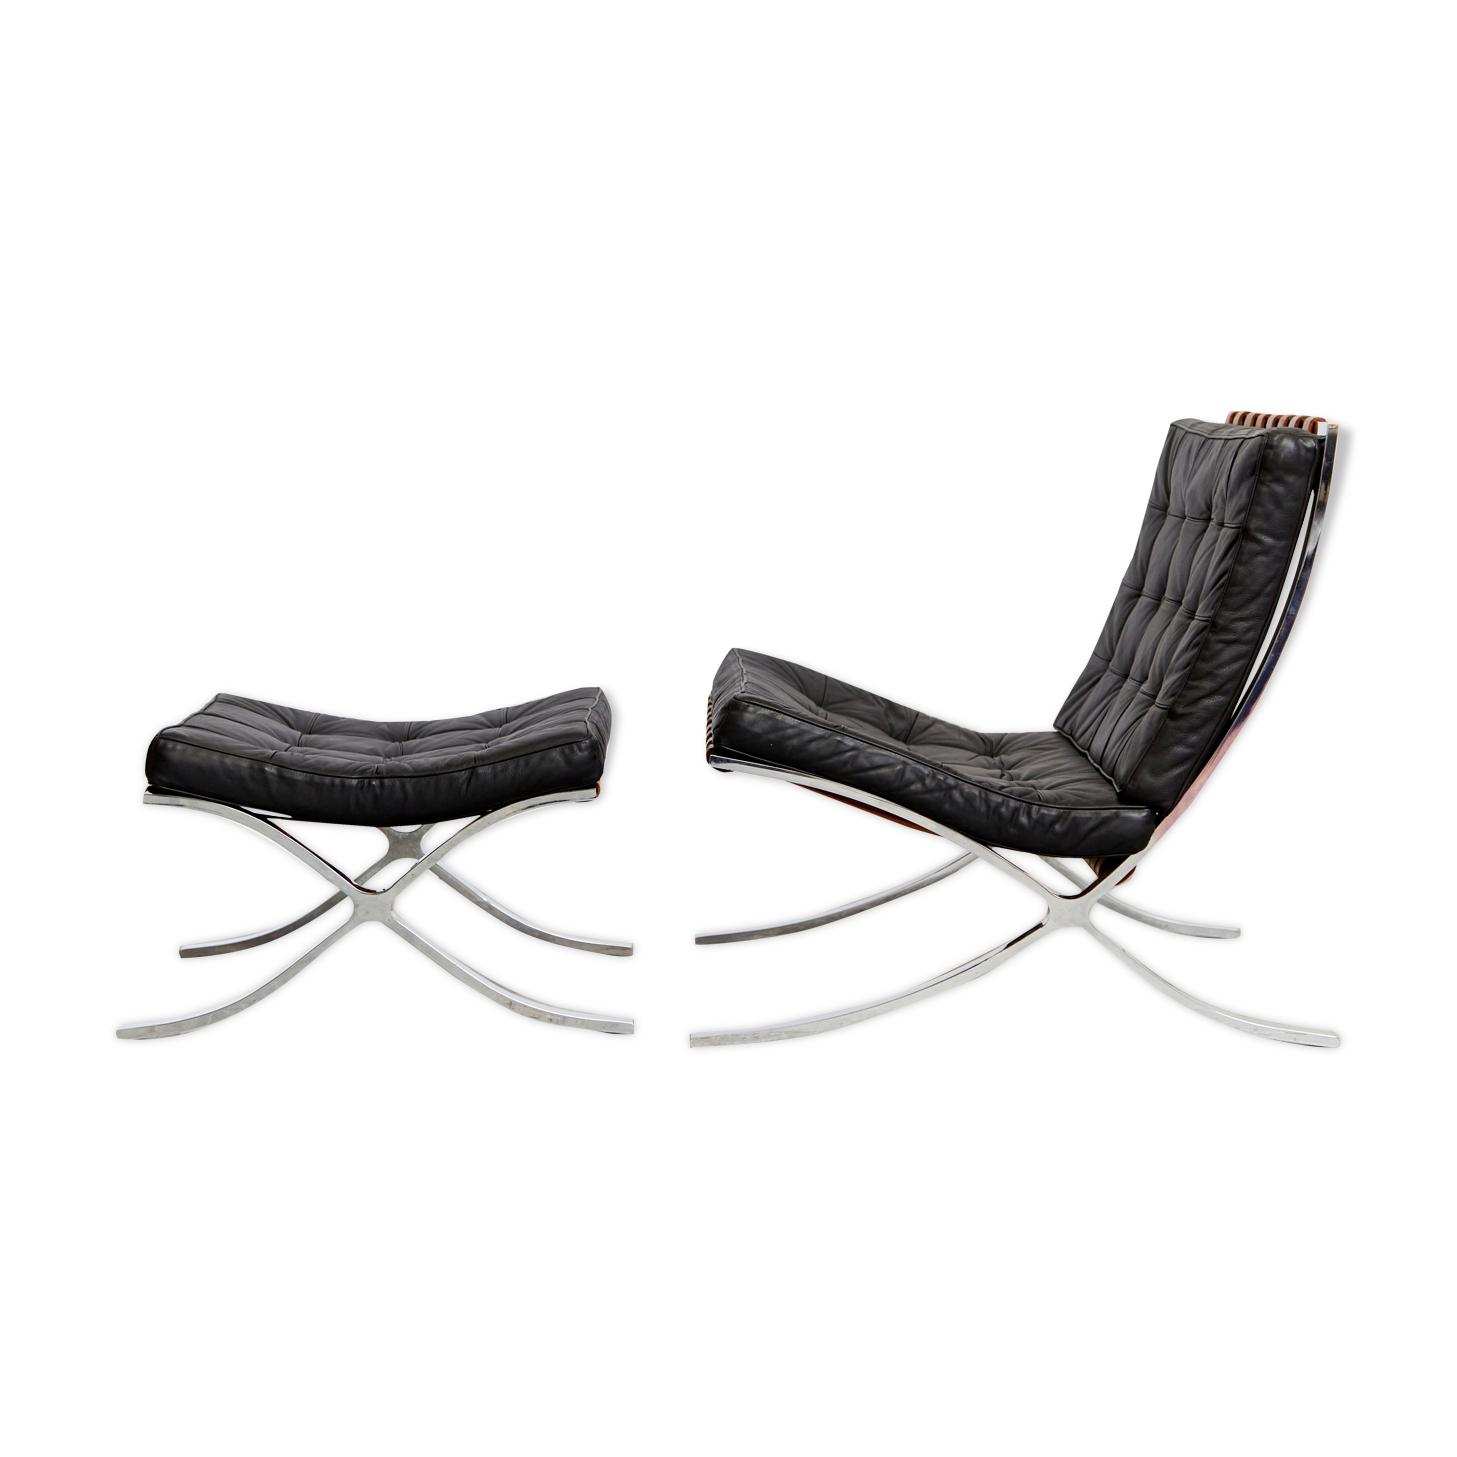 MR90 «Barcelona Chair & Ottomane» design Ludwig Mies van der Rohe, Knoll International